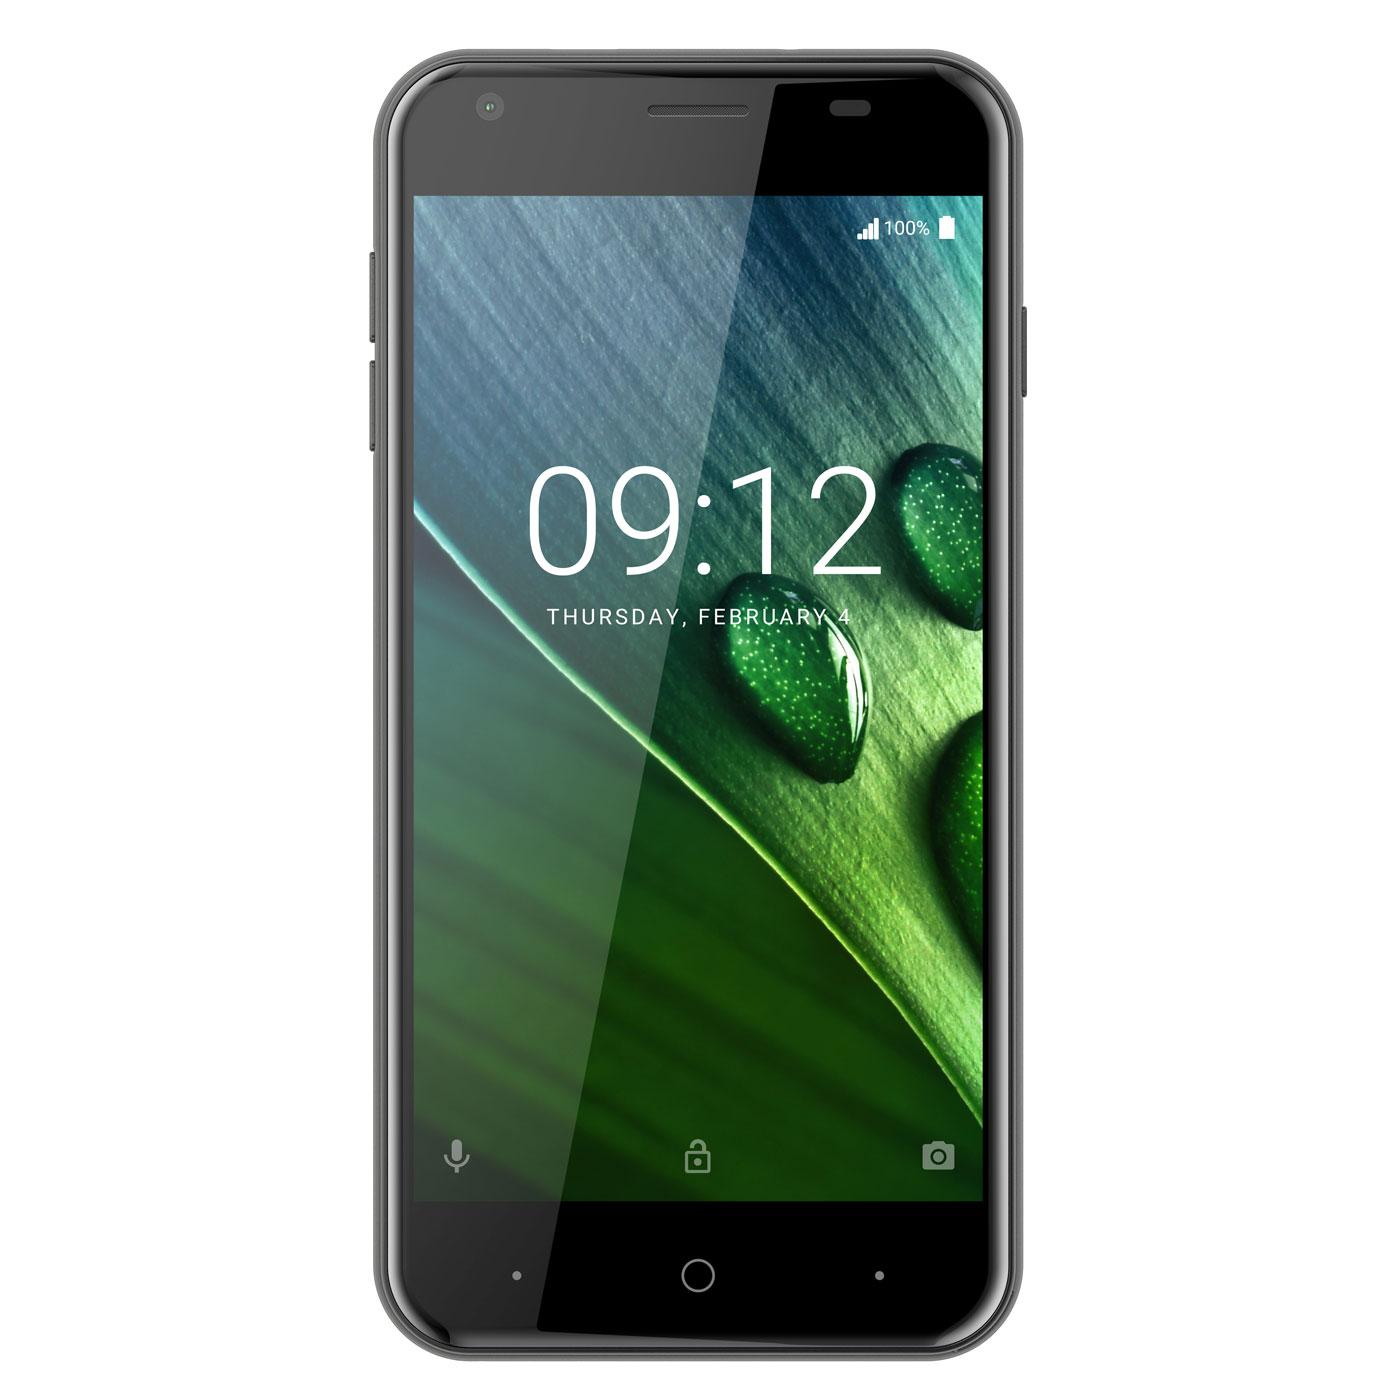 "Mobile & smartphone Acer Liquid Z6 Noir Smartphone 4G-LTE Dual SIM - MediaTek MT6737 Quad-Core 1.3 GHz - RAM 1 Go - Ecran tactile 5"" 720 x 1280 - 8 Go - Bluetooth 4.0 - 2000 mAh - Android 6.0"